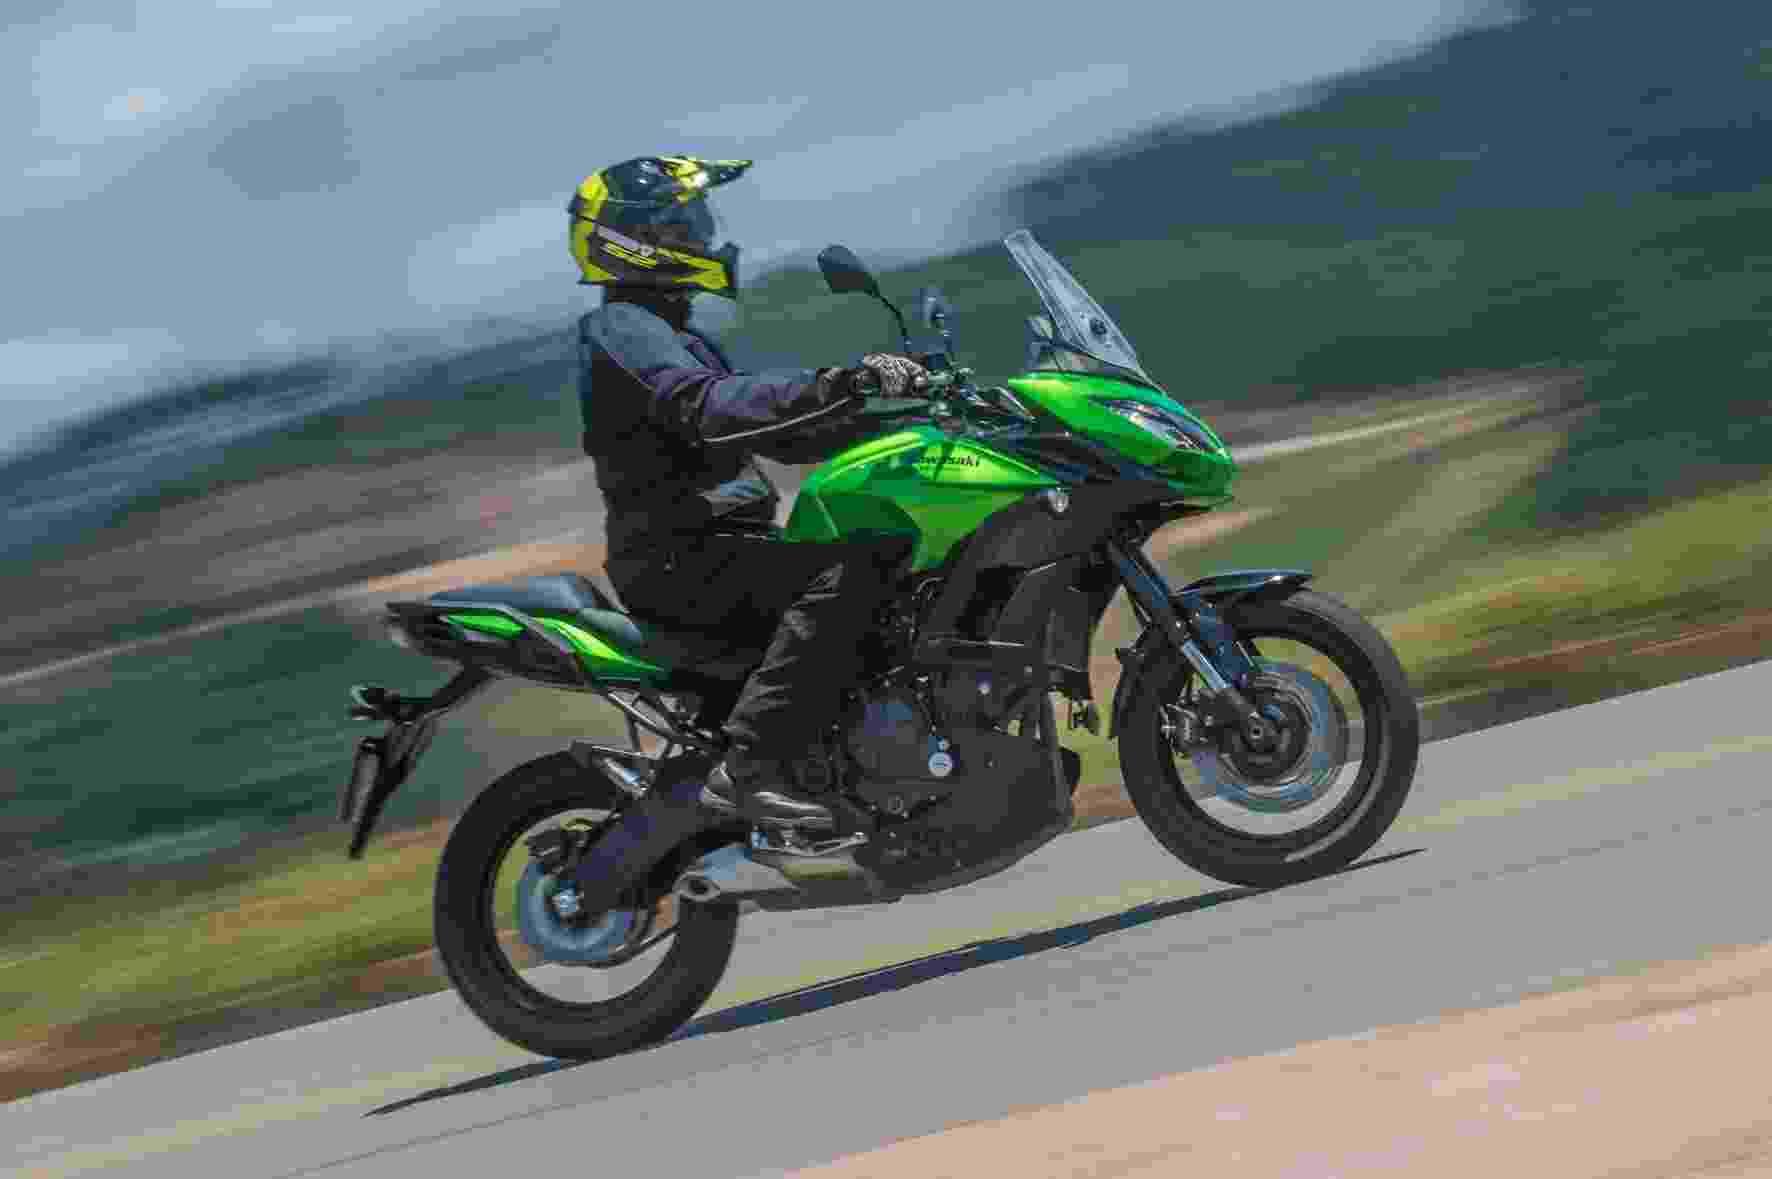 Kawasaki Versys 650 ABS - Doni Castilho/Infomoto